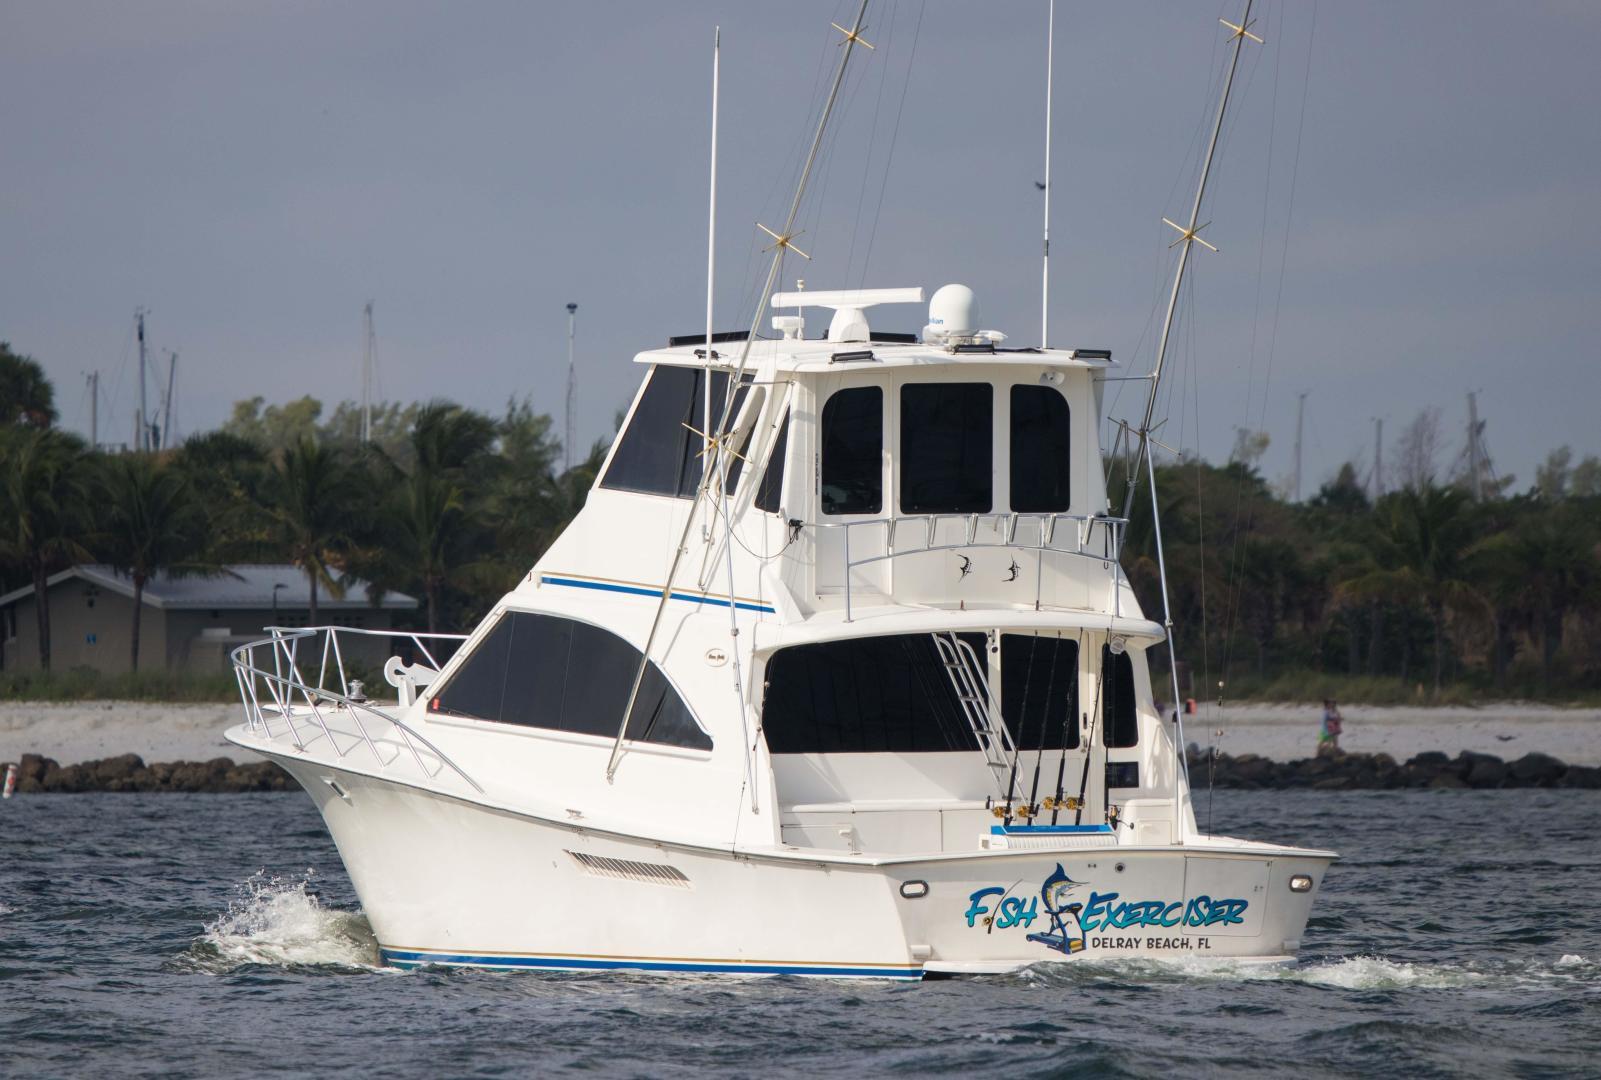 Ocean Yachts 2000-FISH EXERCISER Riviera Beach-Florida-United States-1552093 | Thumbnail